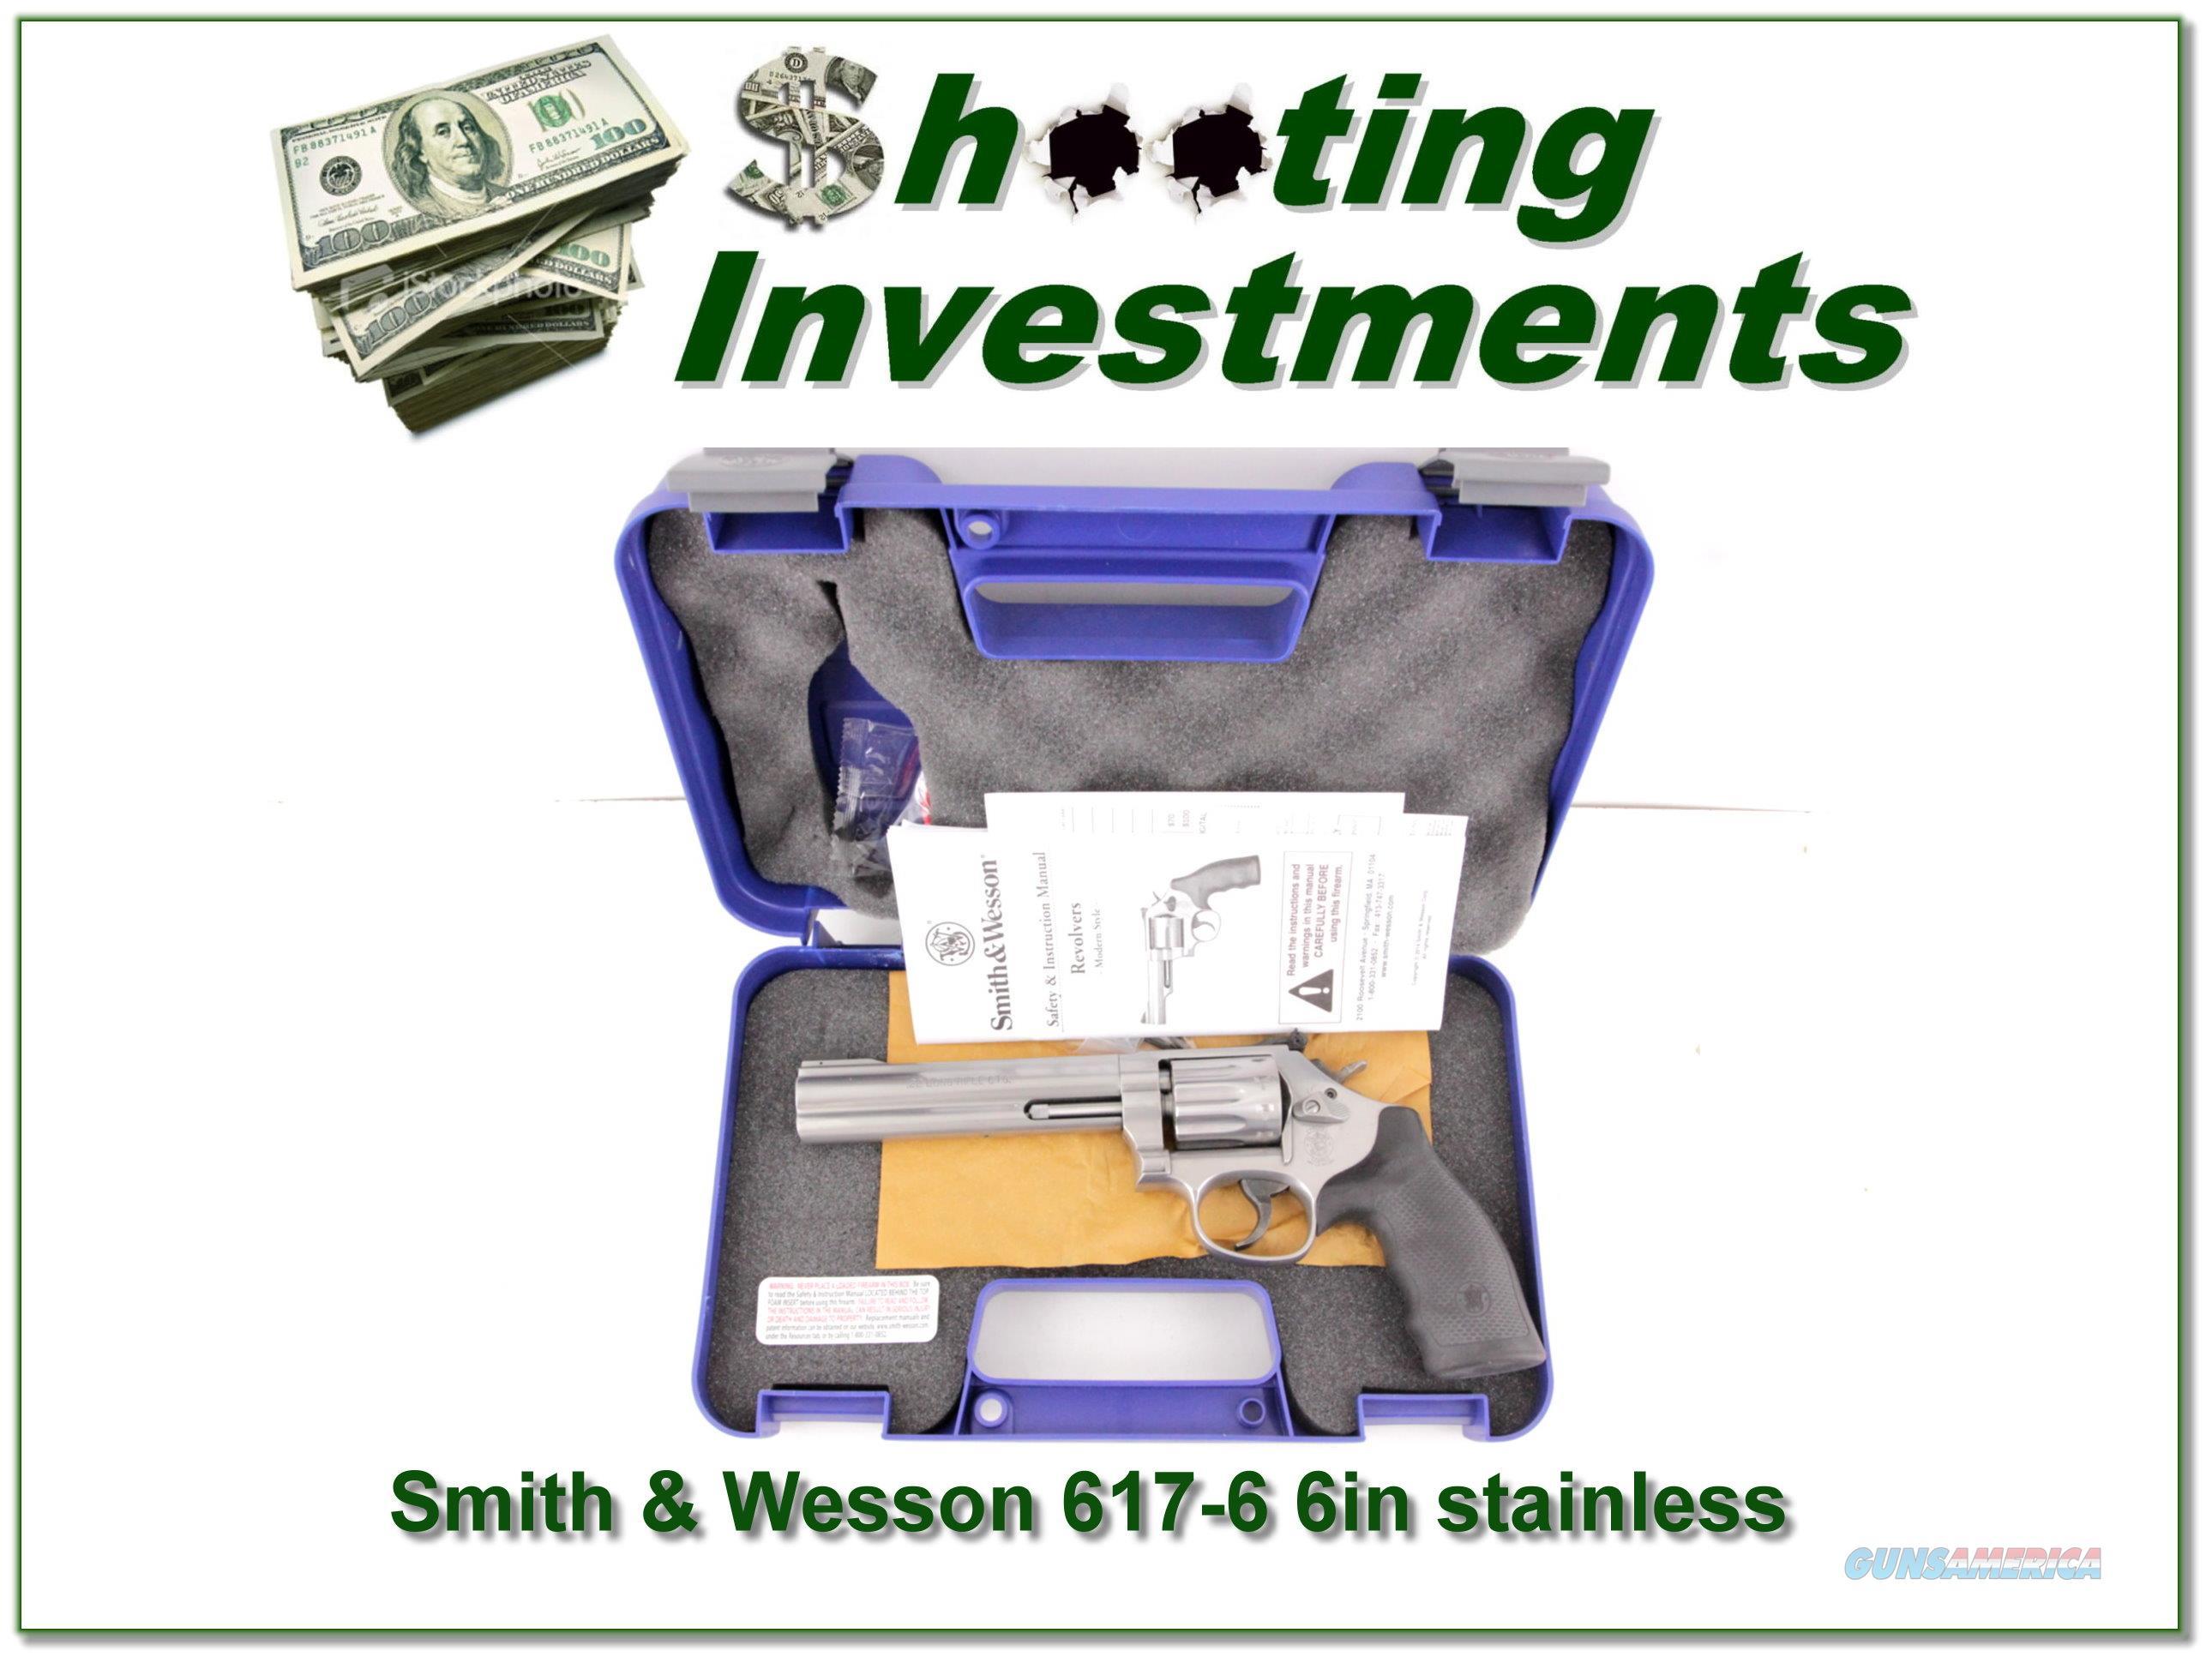 Smith & Wesson 617-6 6in Stainless 22LR LNIC  Guns > Pistols > Smith & Wesson Revolvers > Full Frame Revolver